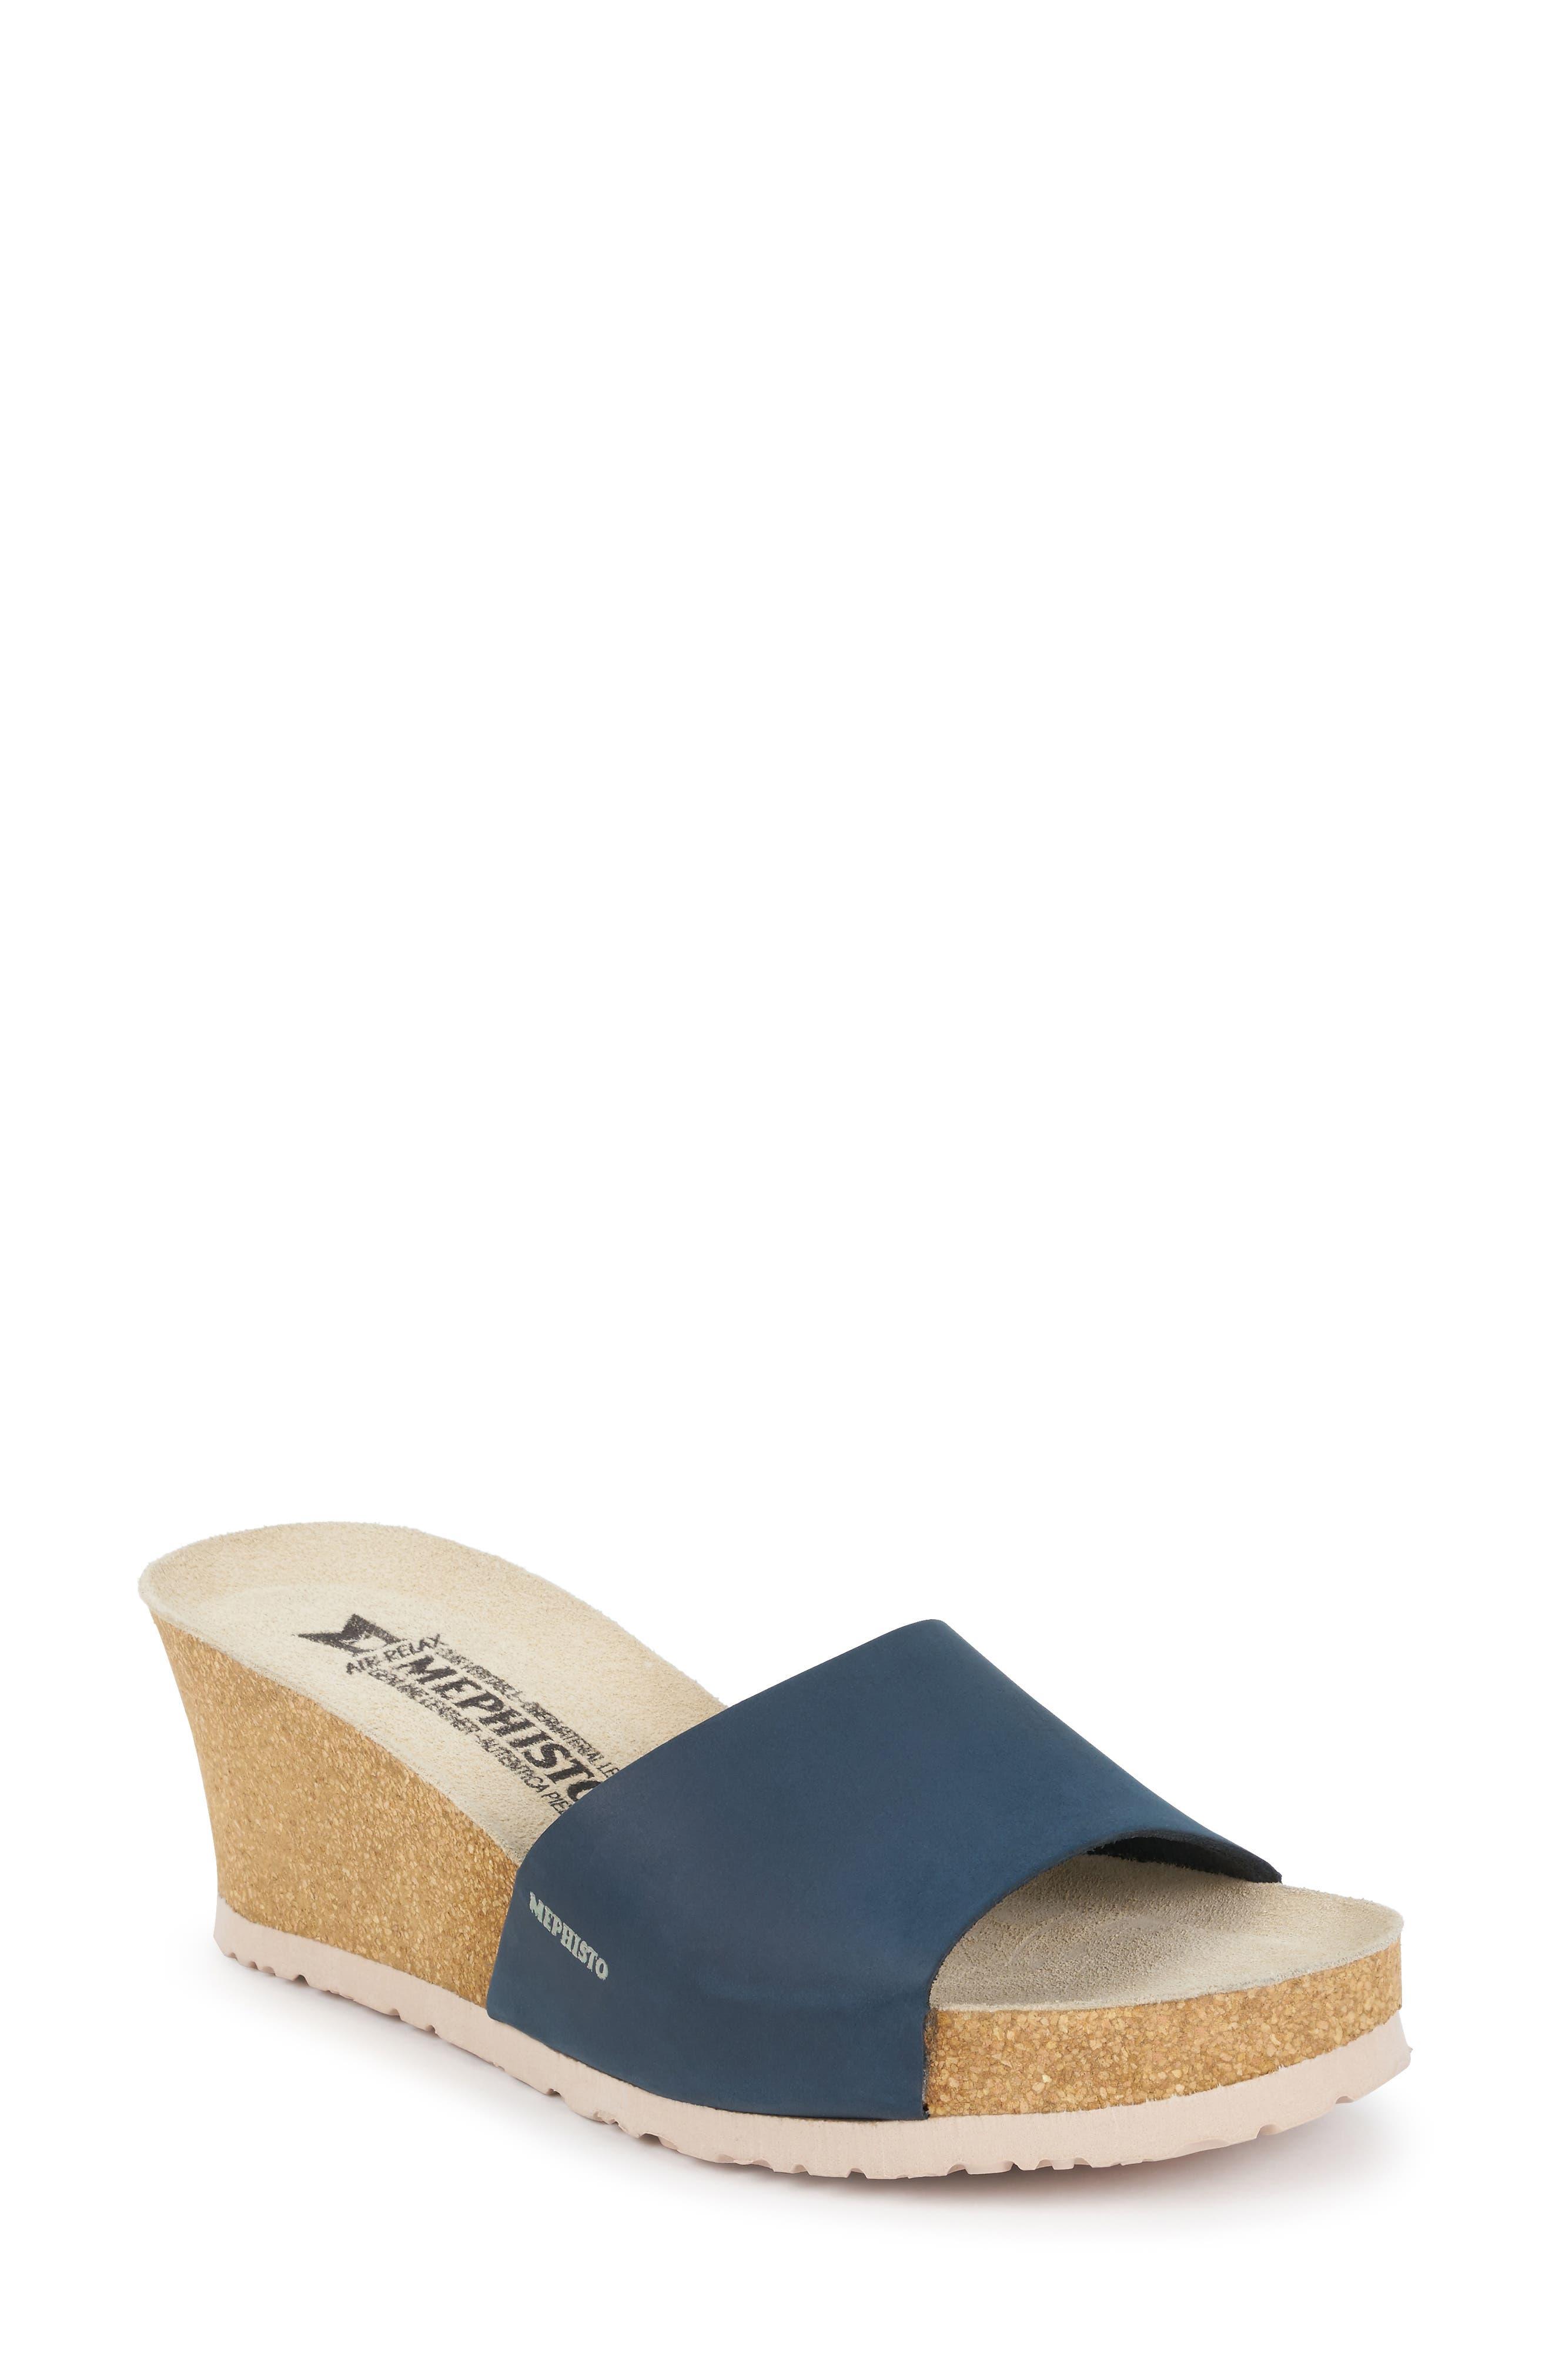 Women's Mephisto Sandals: Sale   Nordstrom